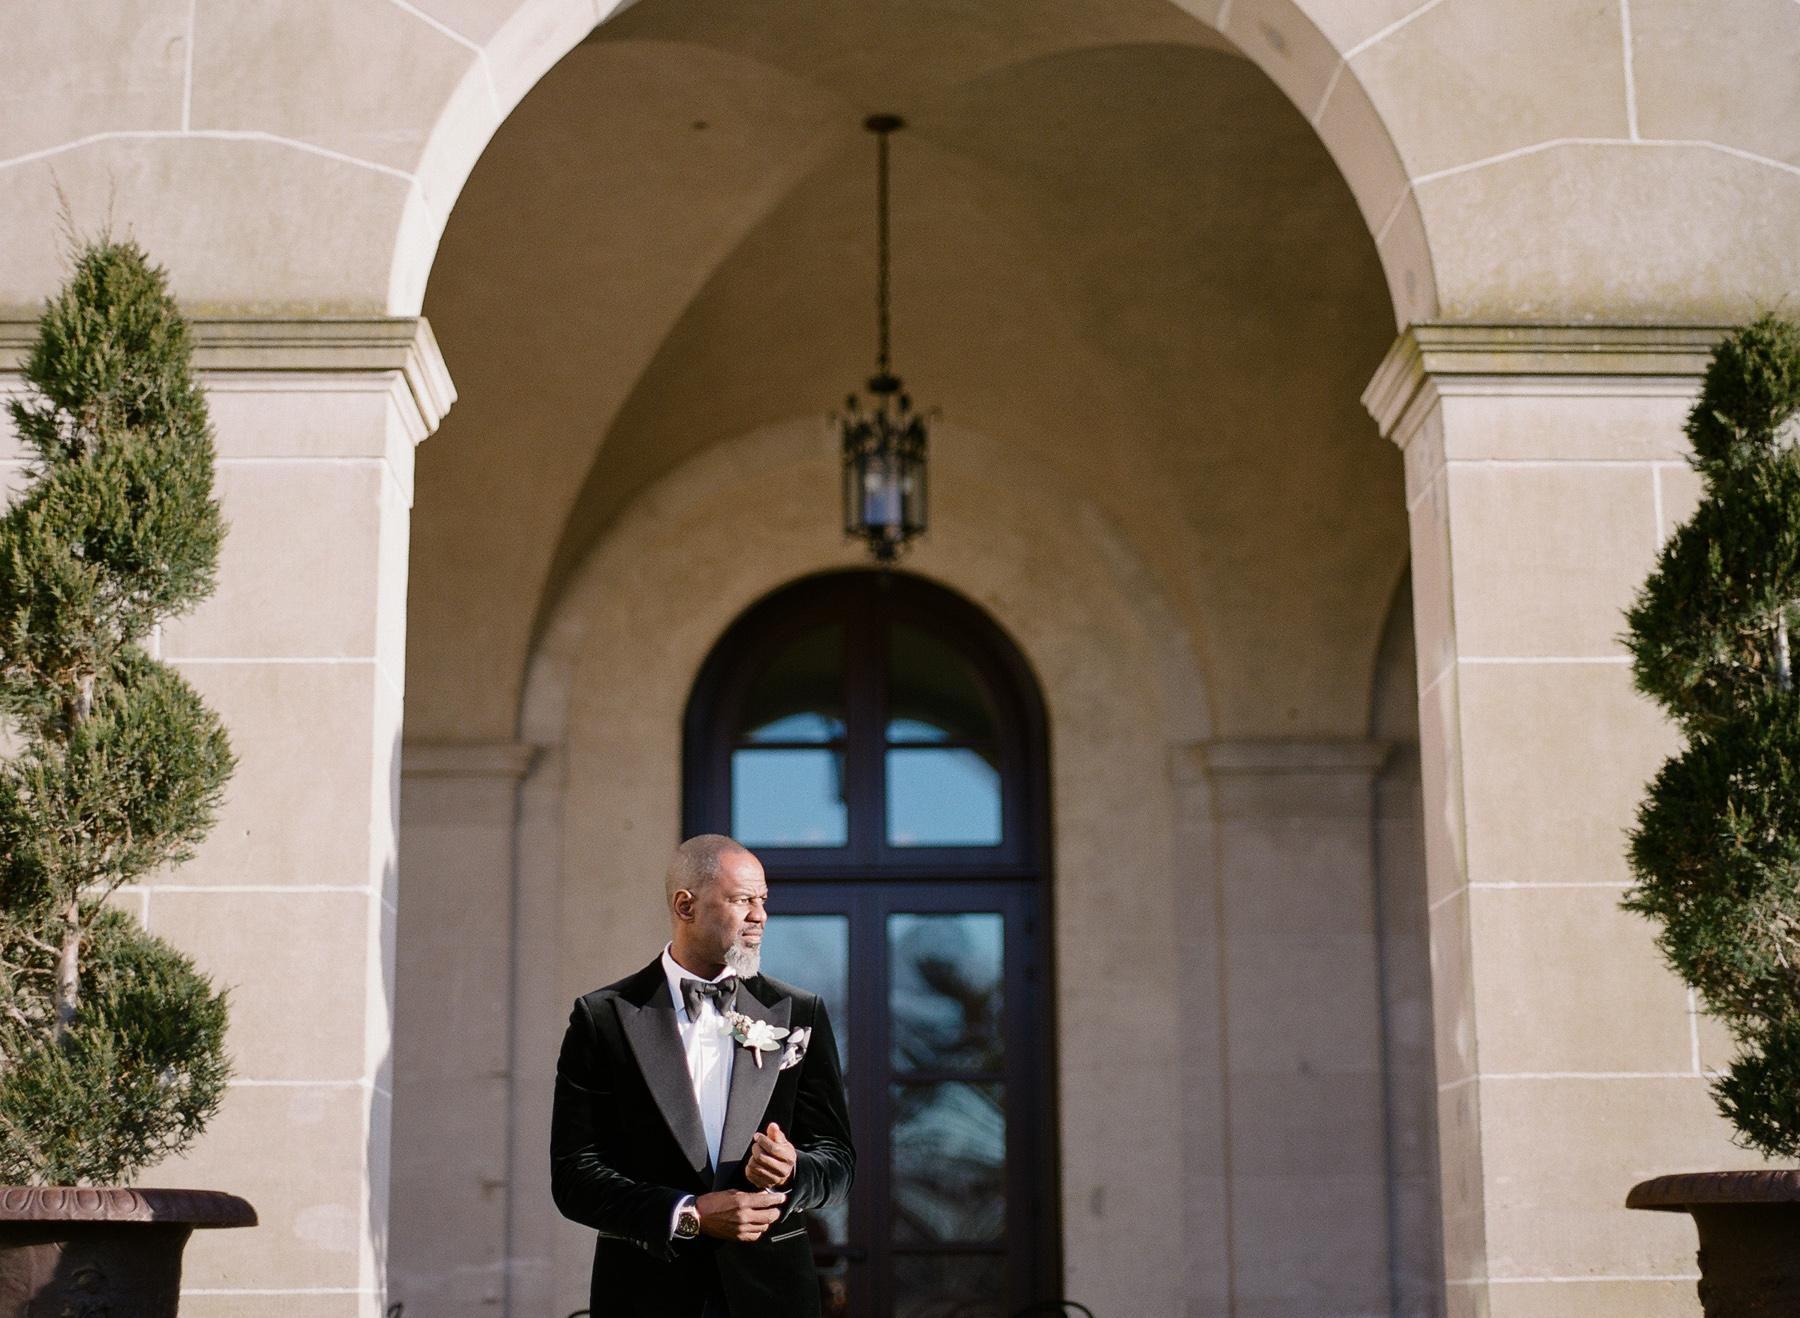 Brian-McKnight-wedding-oheka-castle-050.jpg